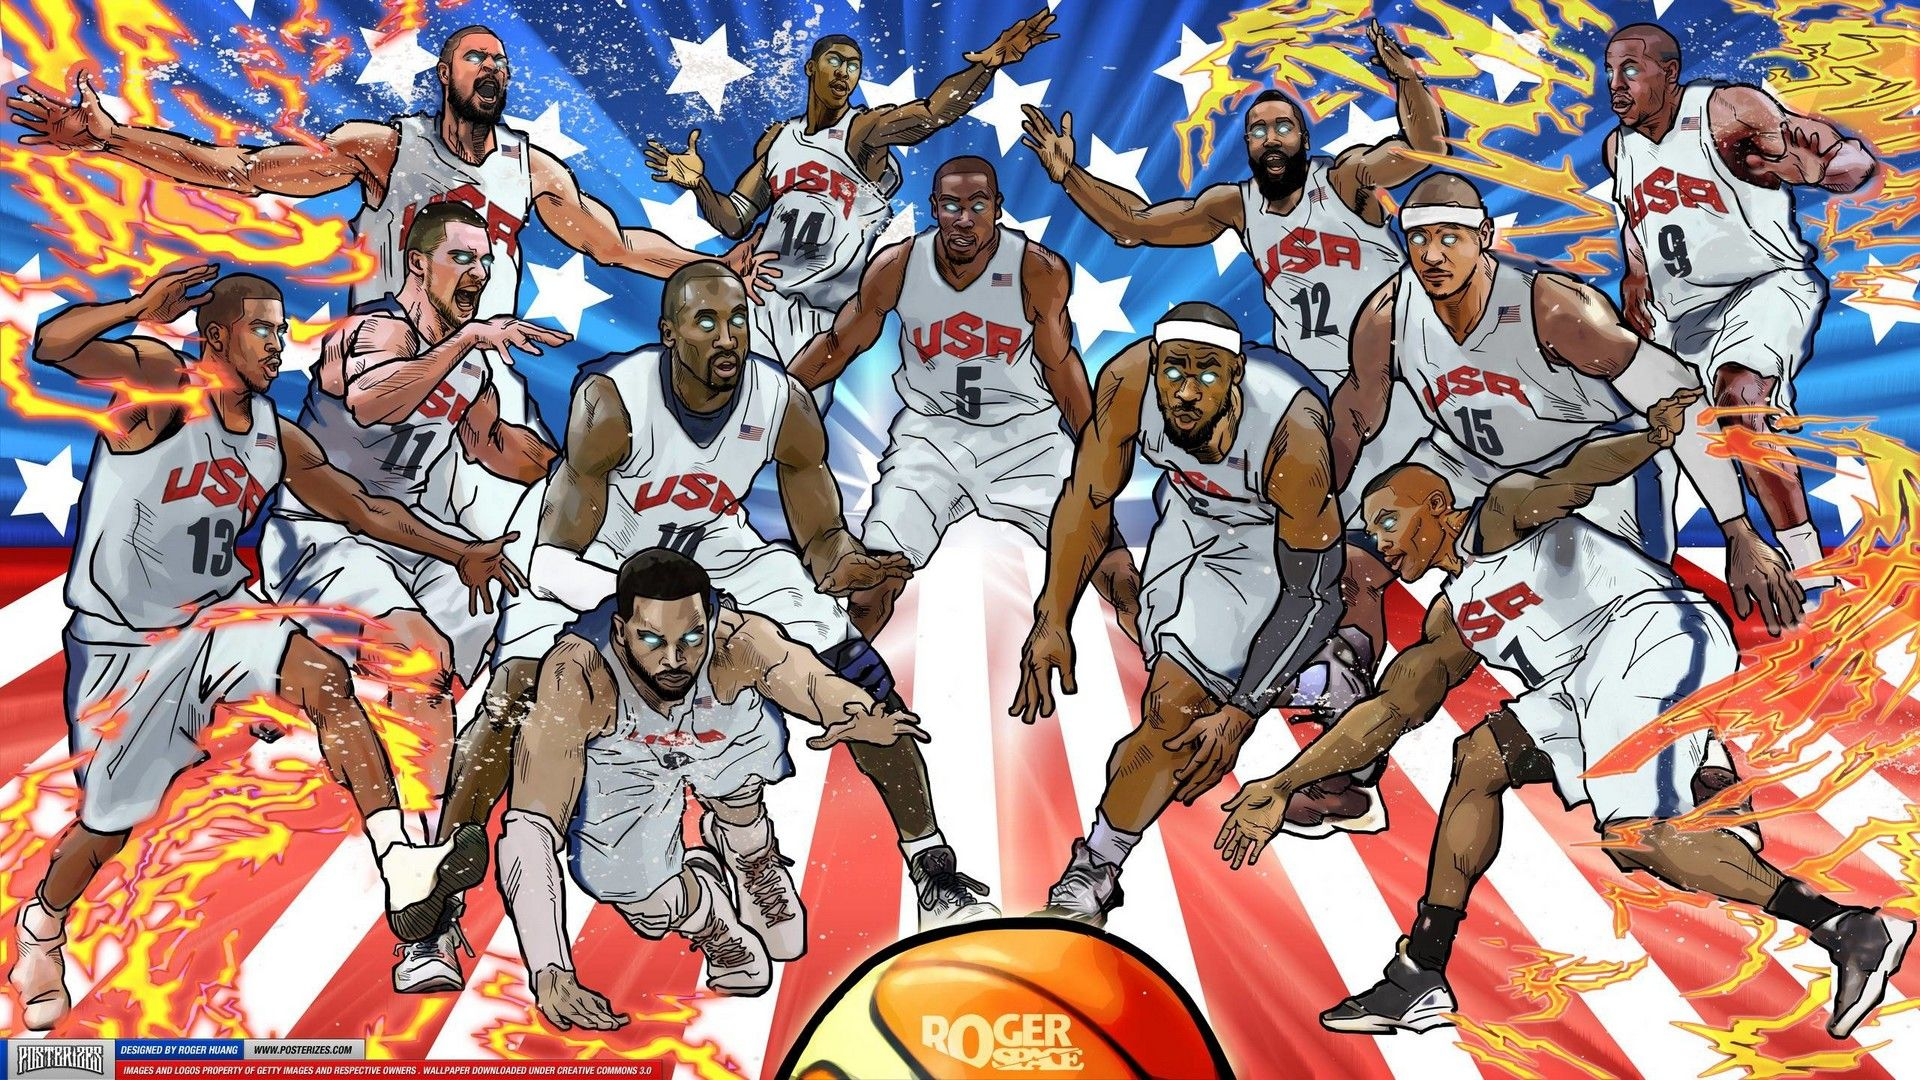 Nba Desktop Wallpapers In 2020 Nba Wallpapers Basketball Wallpaper Cartoon Wallpaper